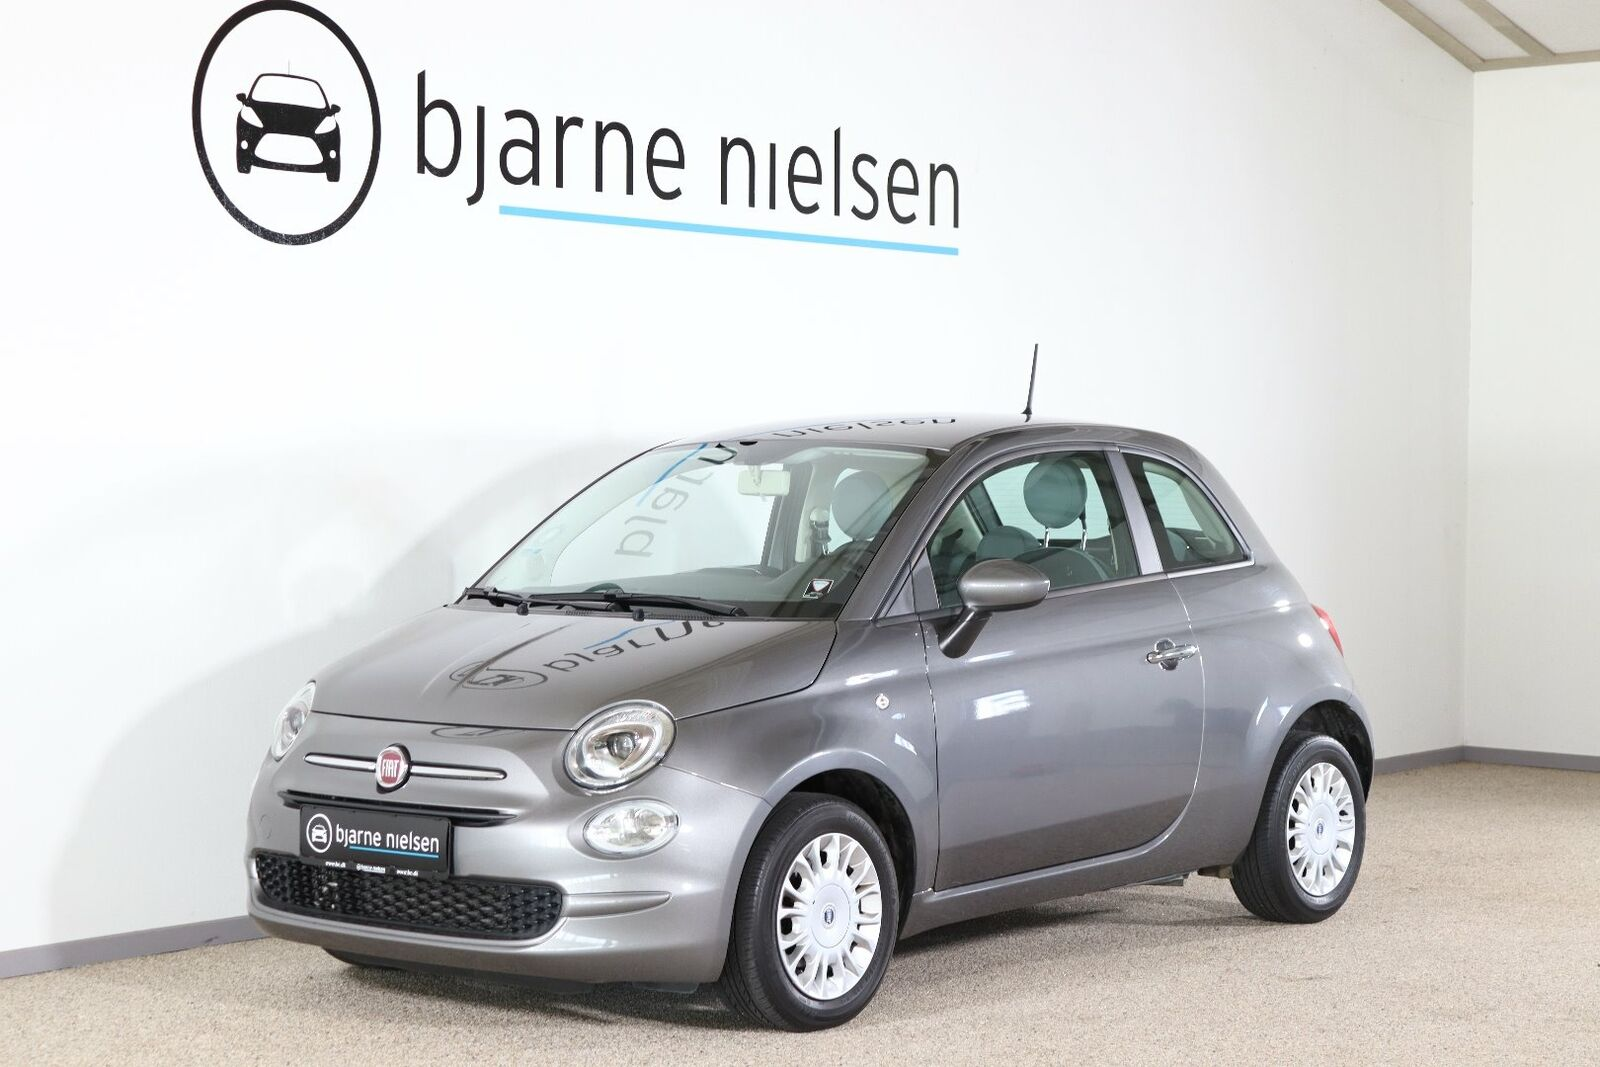 Fiat 500 Billede 5